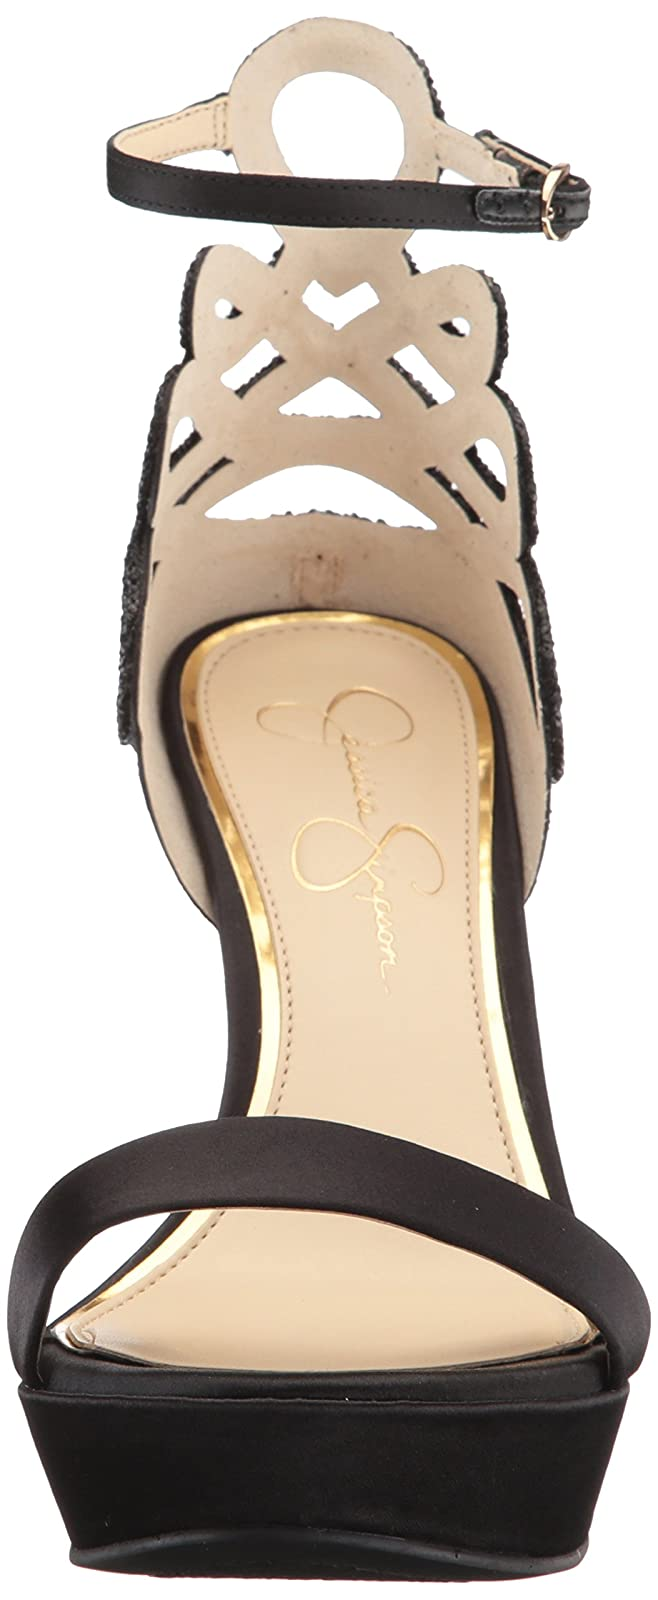 Jessica Simpson Women's BAYVINN Heeled Sandal US - 4